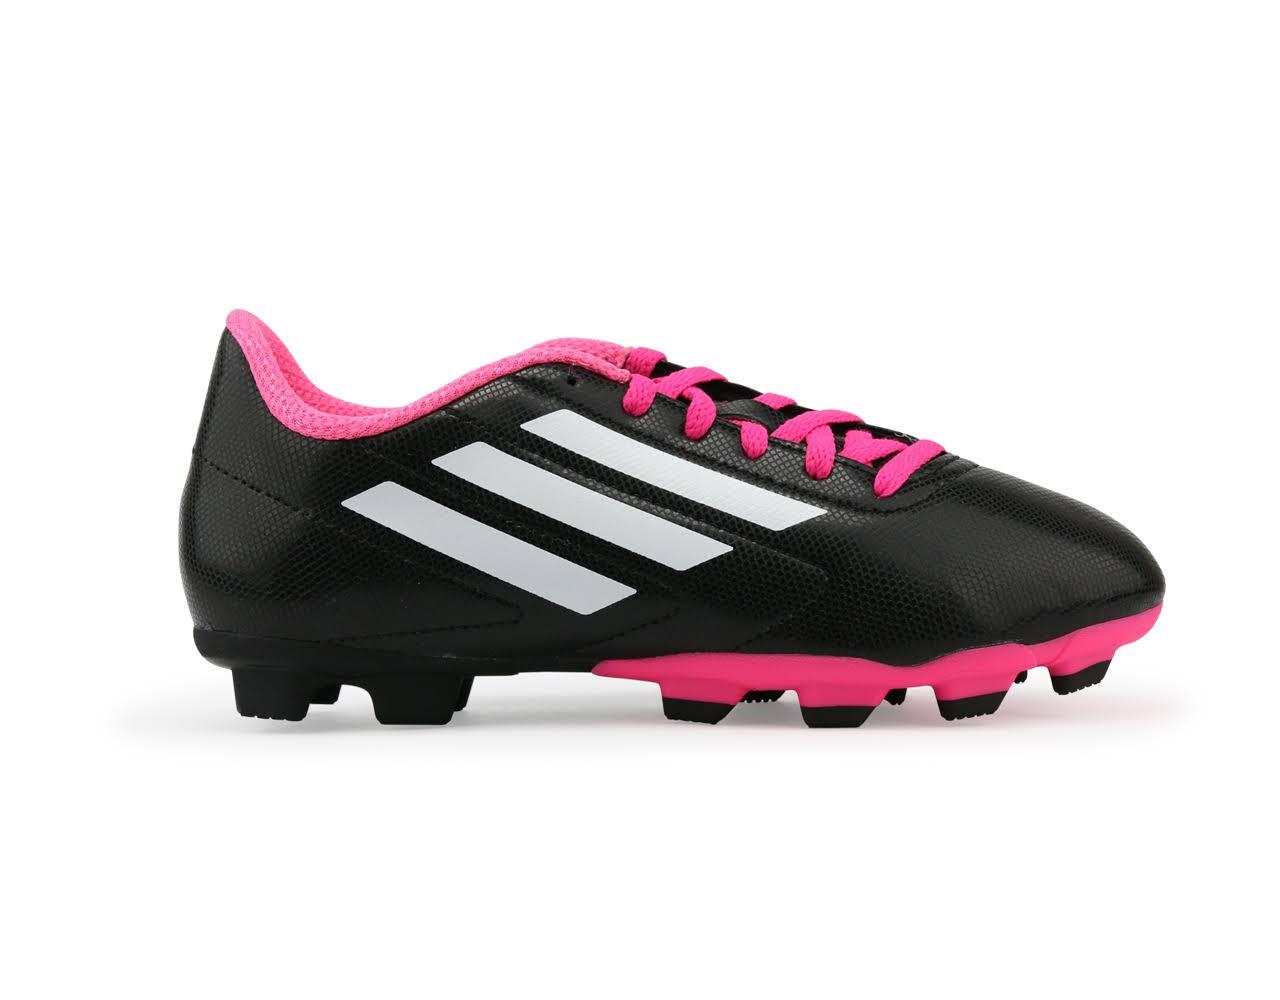 Botín Kids Conquisto Para Rosa Negro De Exterior Adidas 1 Fútbol B25593 YzZWEYqwrX